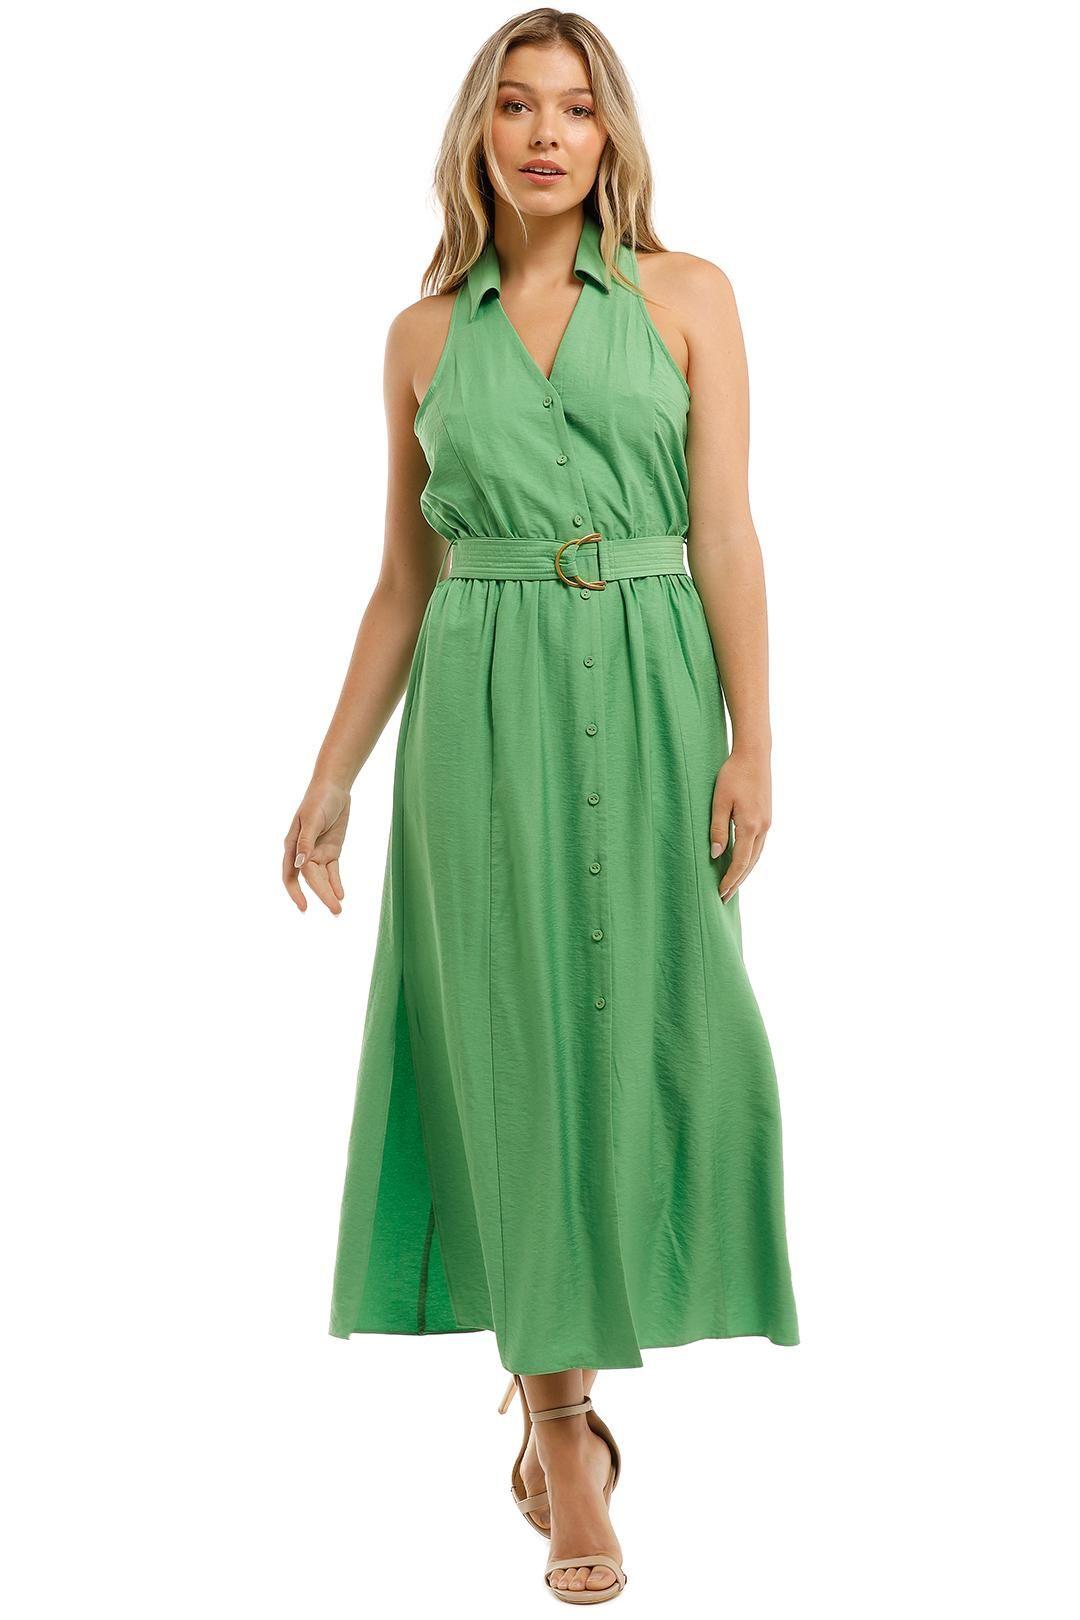 Witchery Green Halter Shirt Midi Dress Button